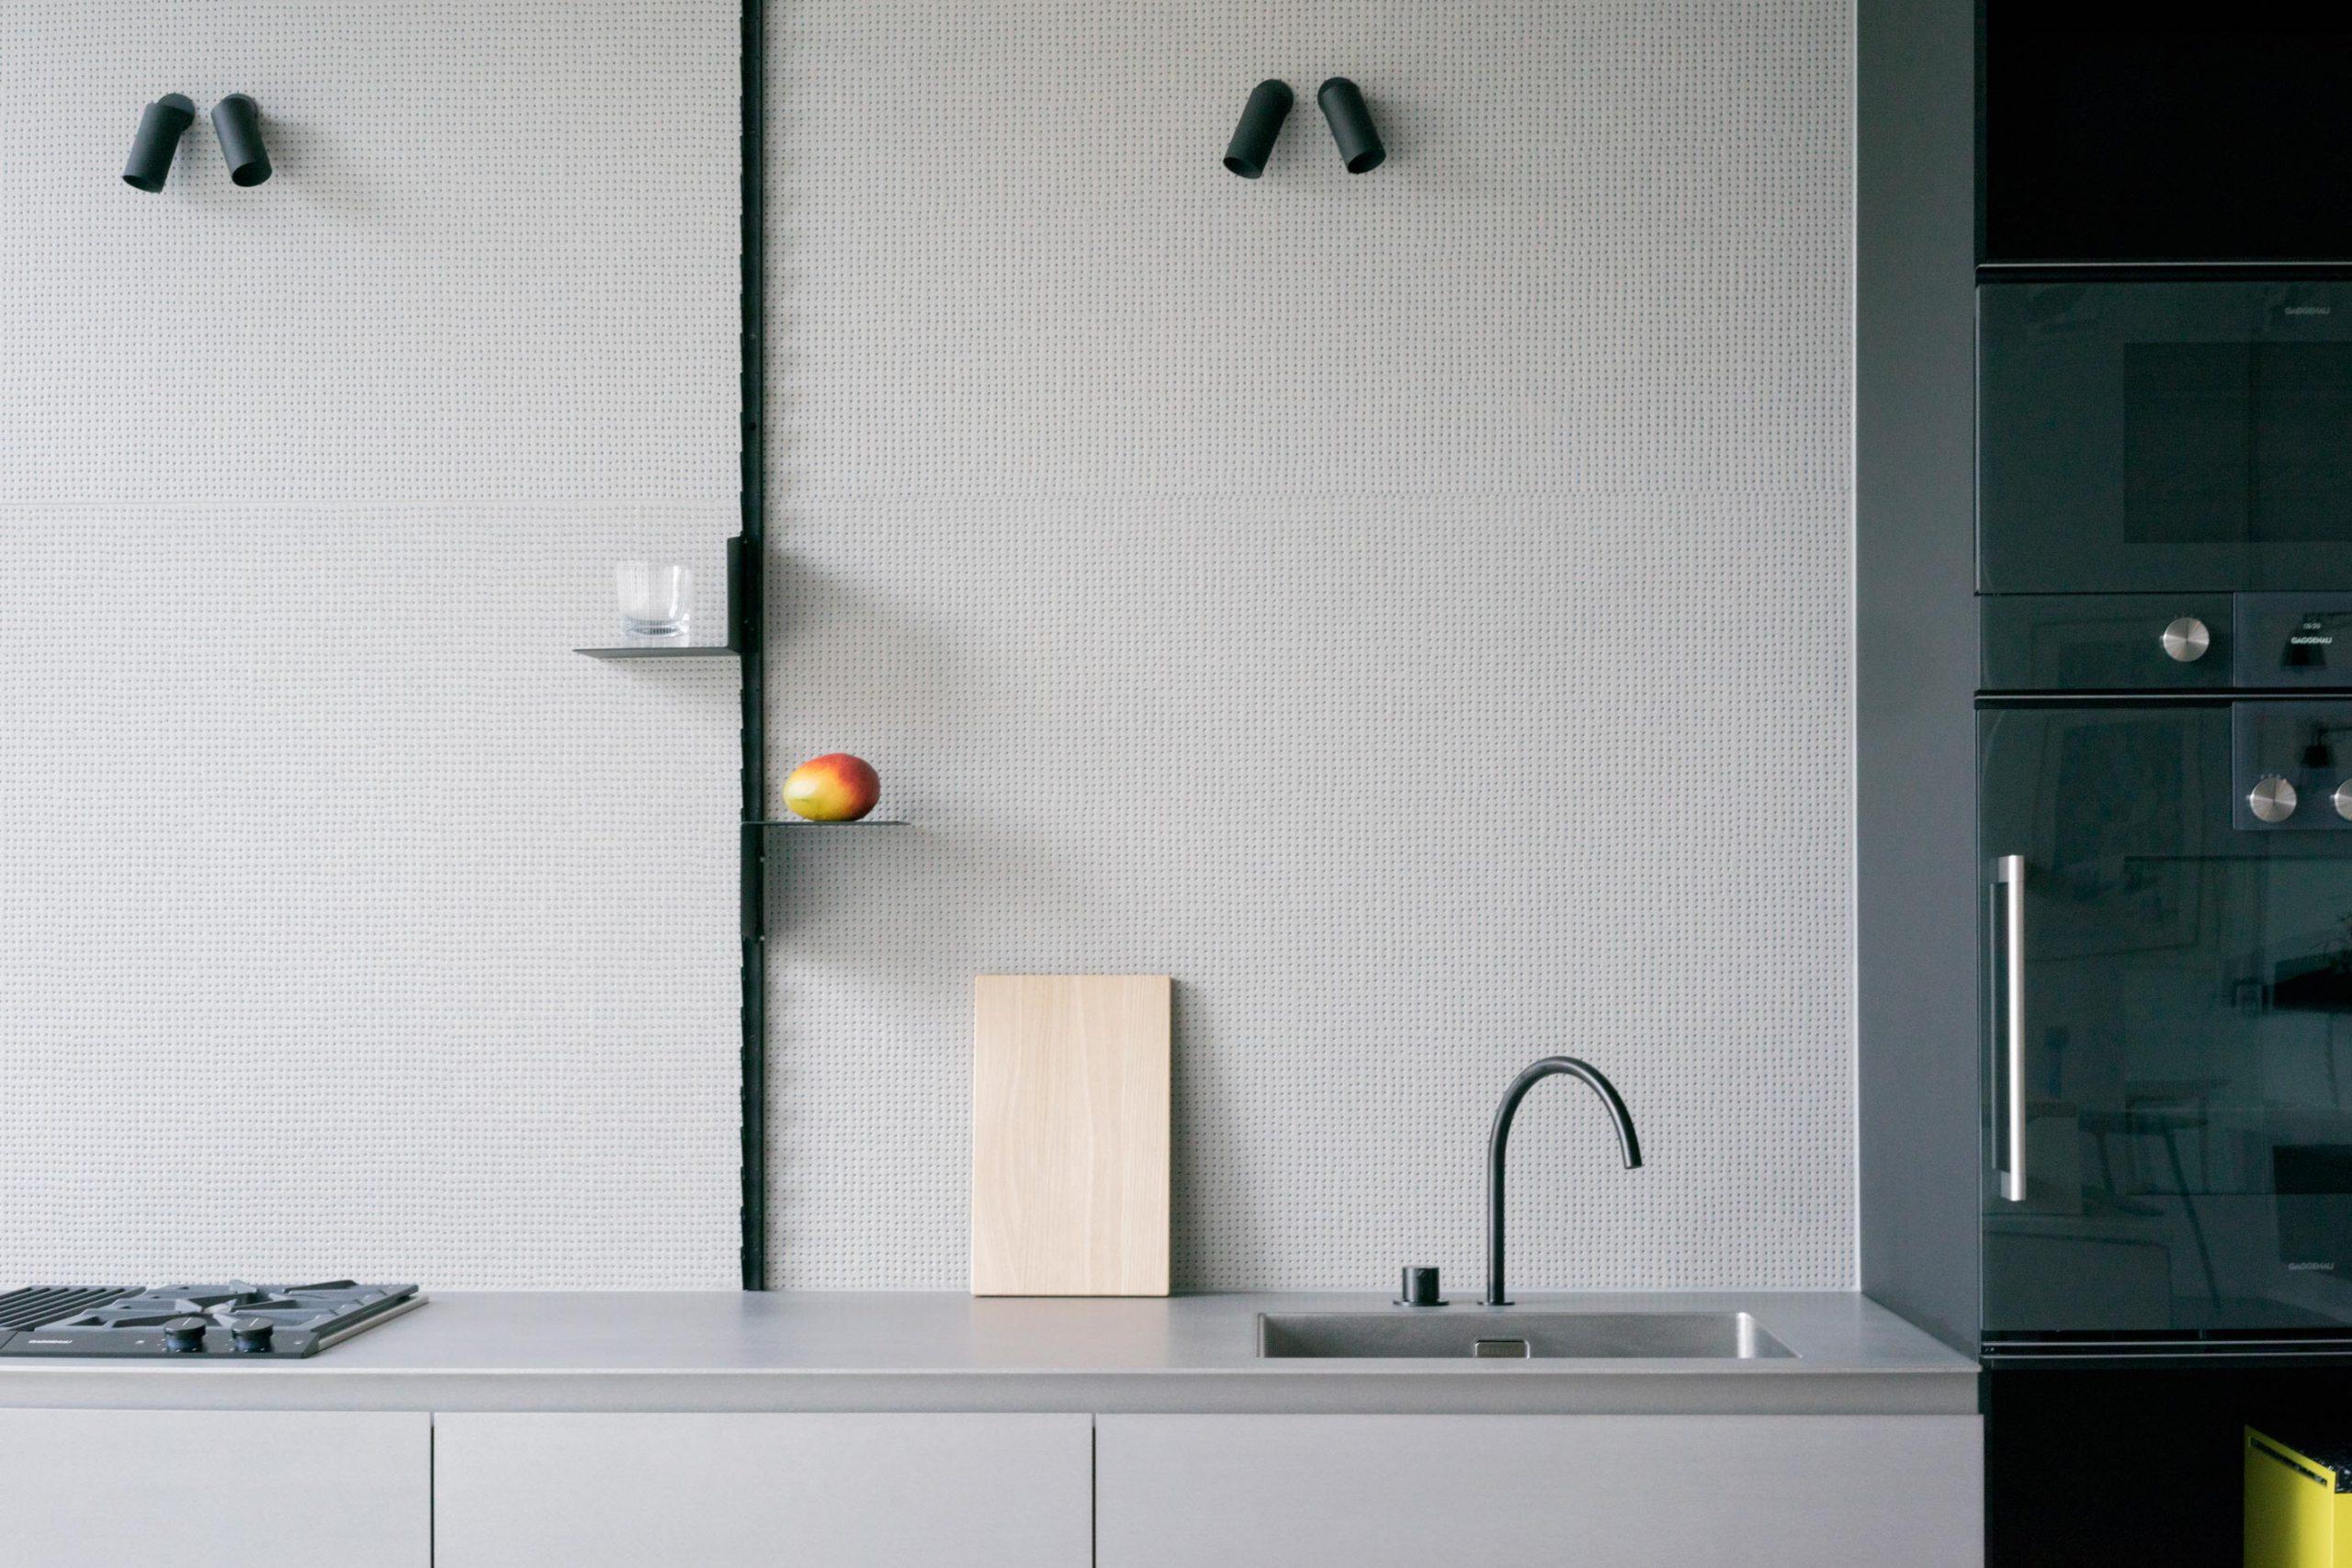 MK 1 Kitchen with grey, textured Mutina tiles backsplash